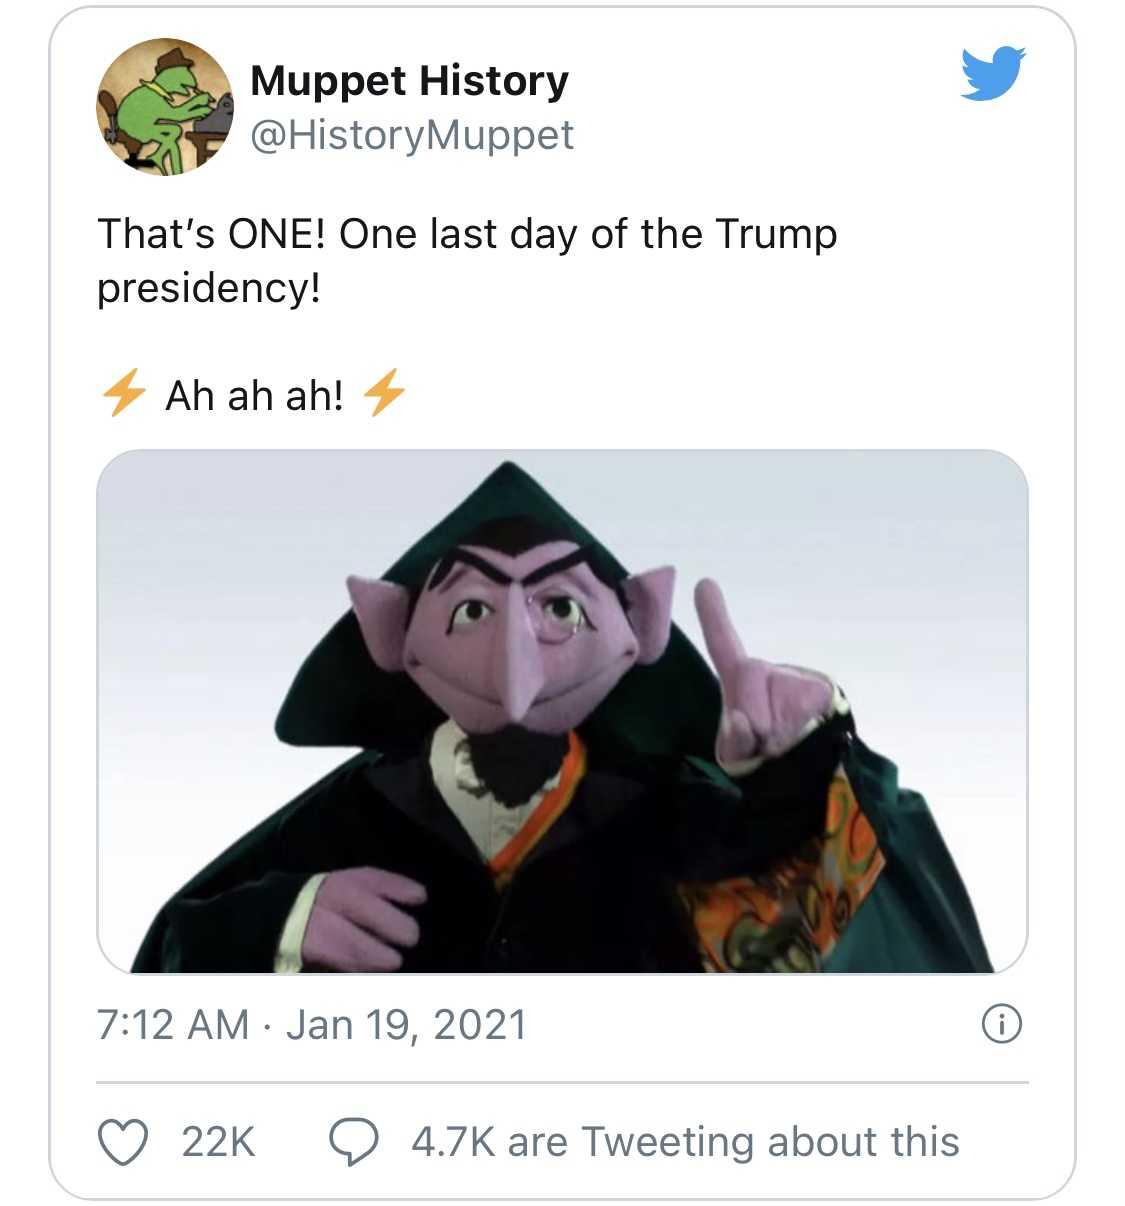 Trump Last Day Memes - Count Dracula